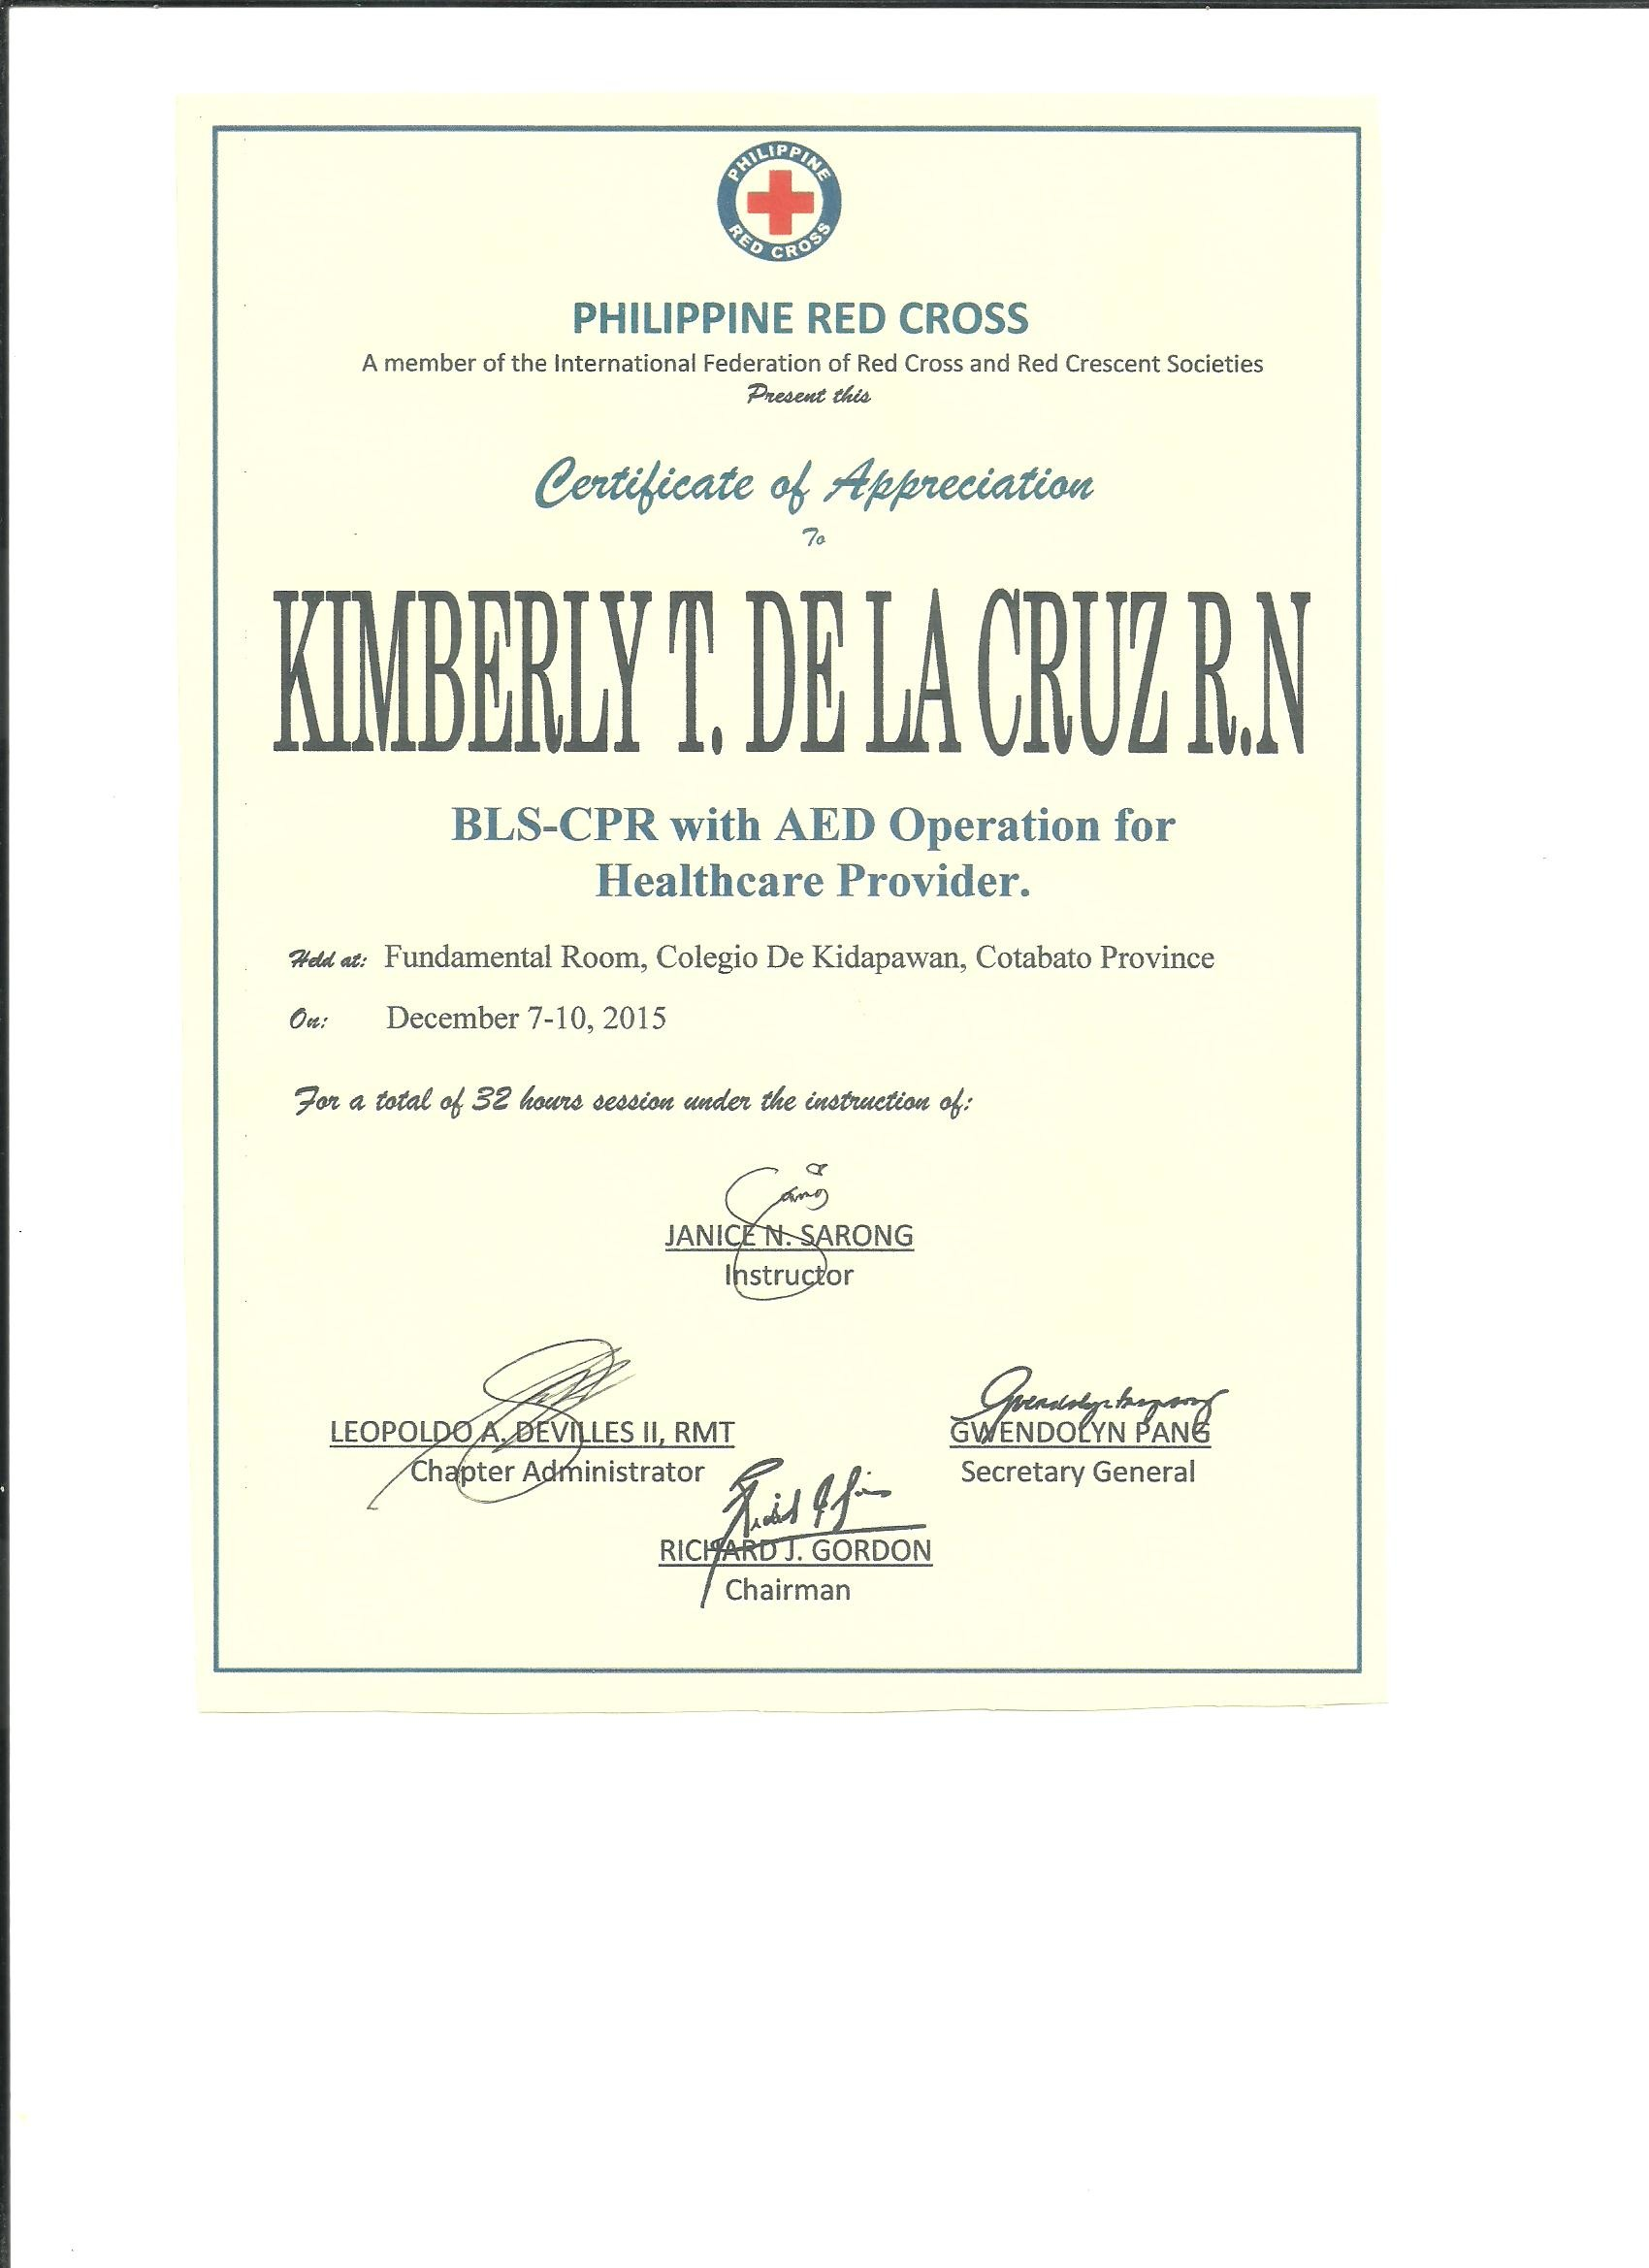 Kimberly De La Cruz Bayt